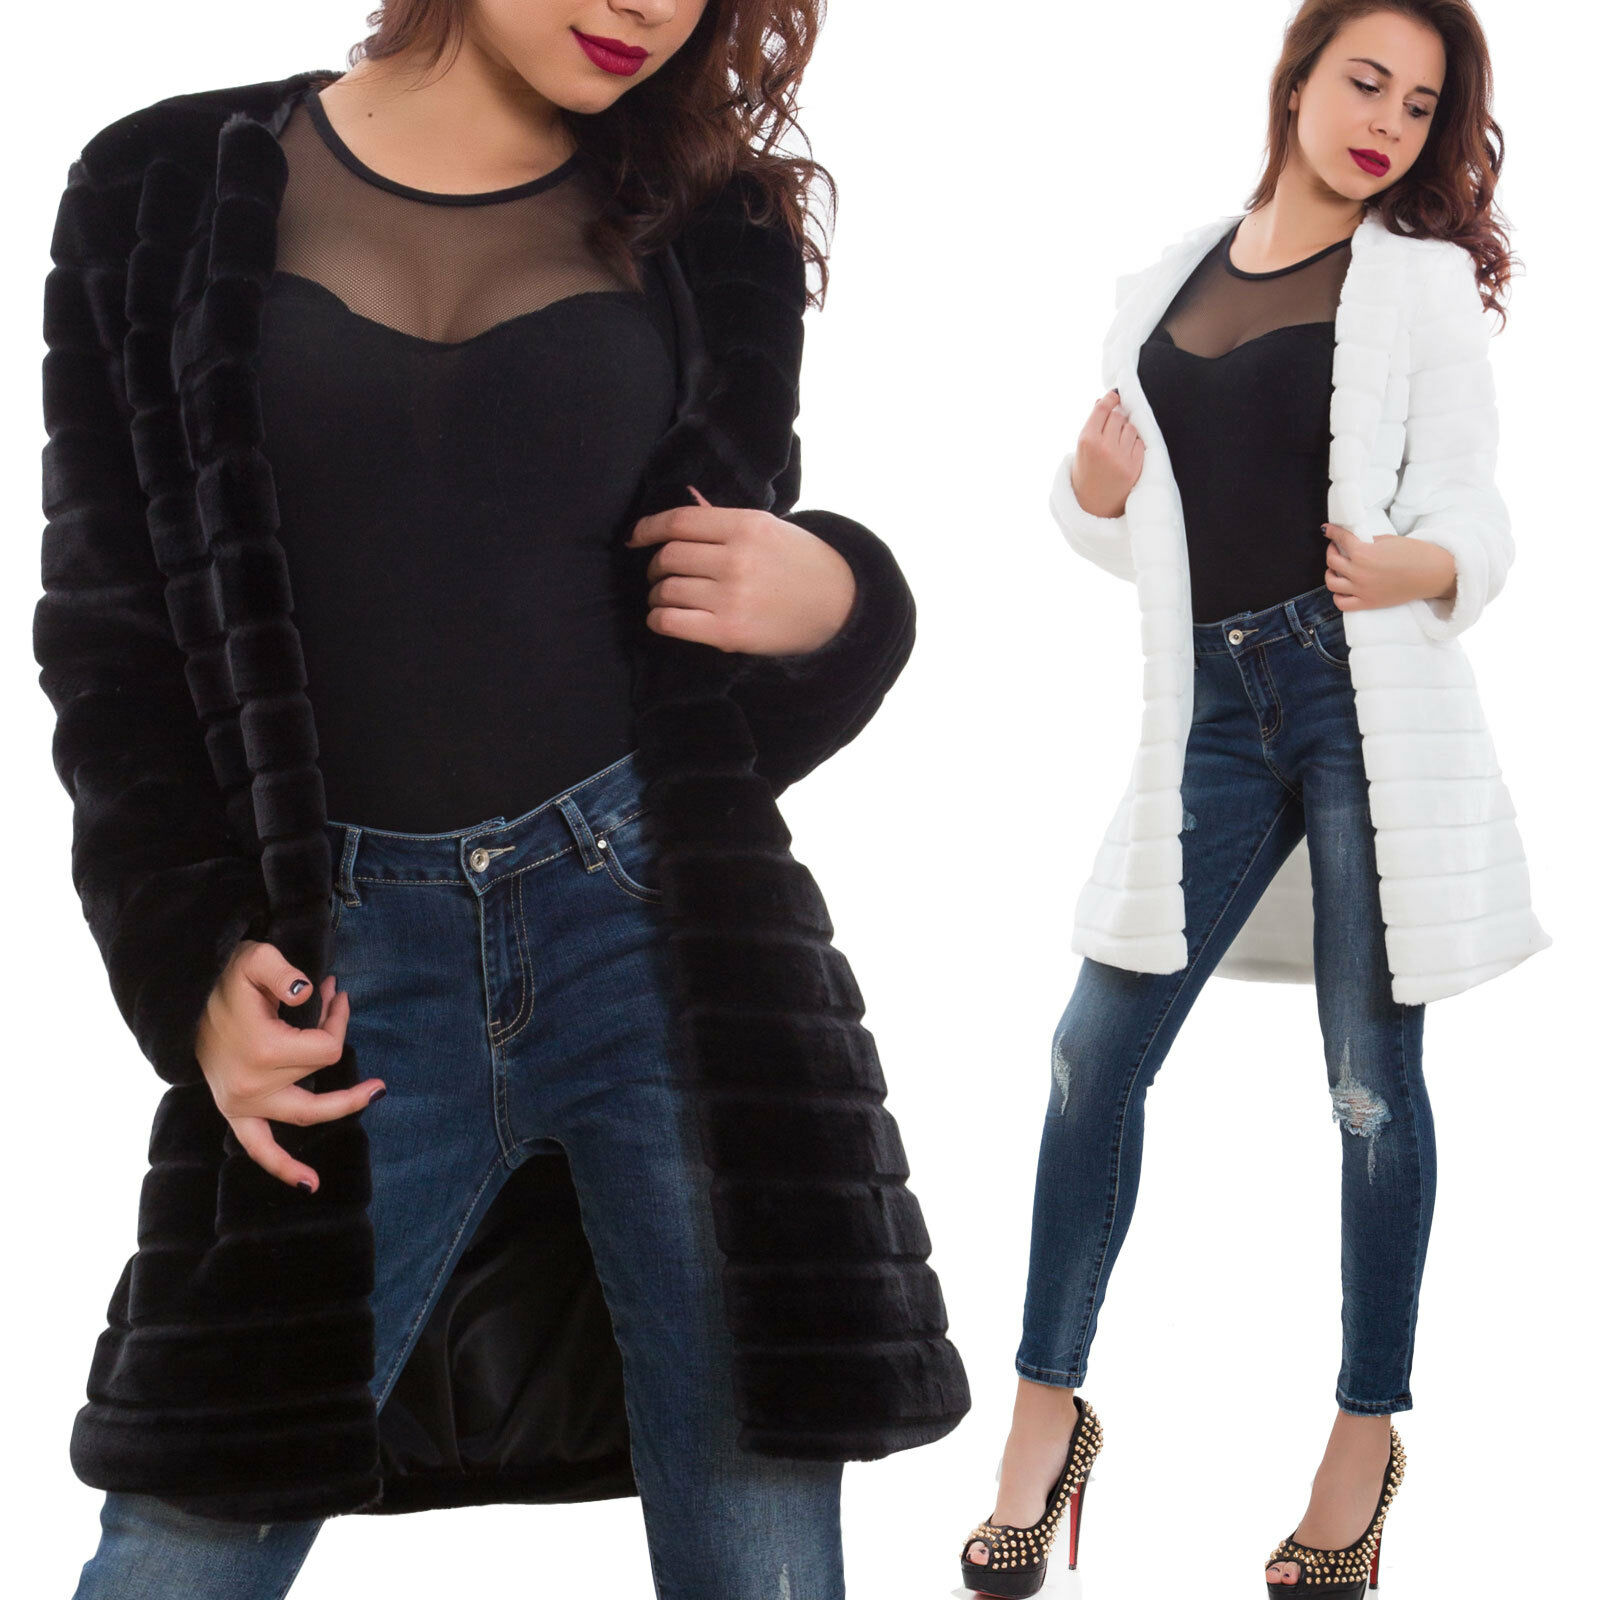 Piel ecológico women abrigo piel sintética manga larga nueva AS-2612